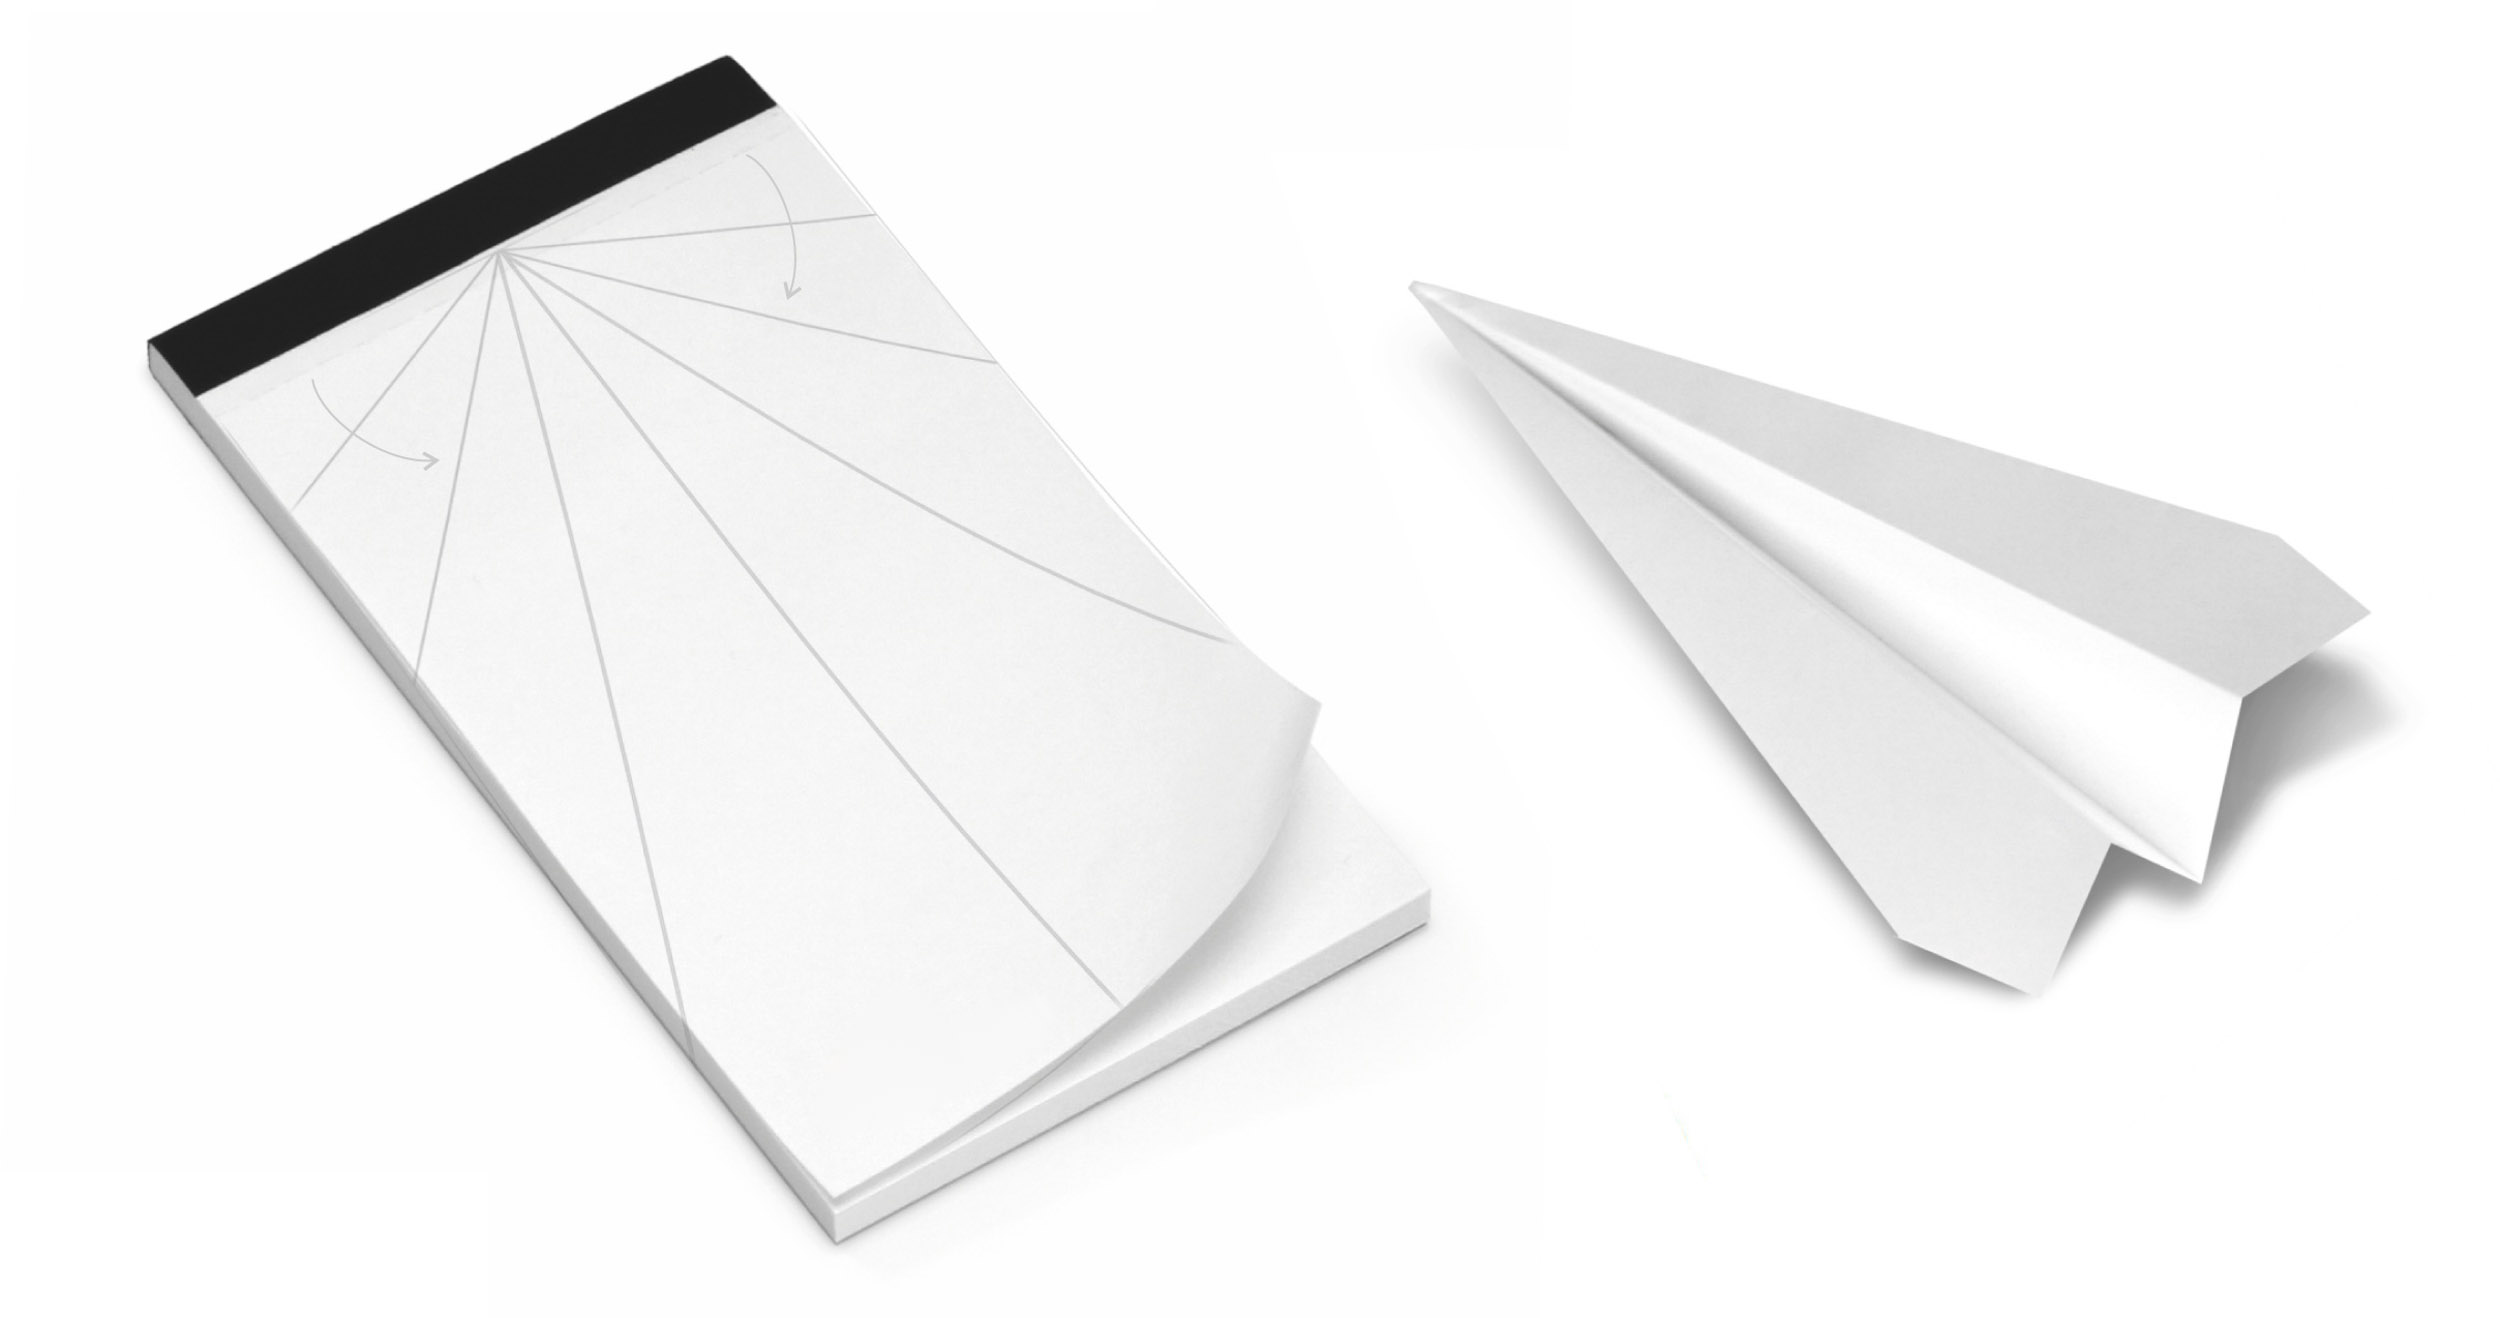 Entwurf-Papierflieger-Merchandise.jpg